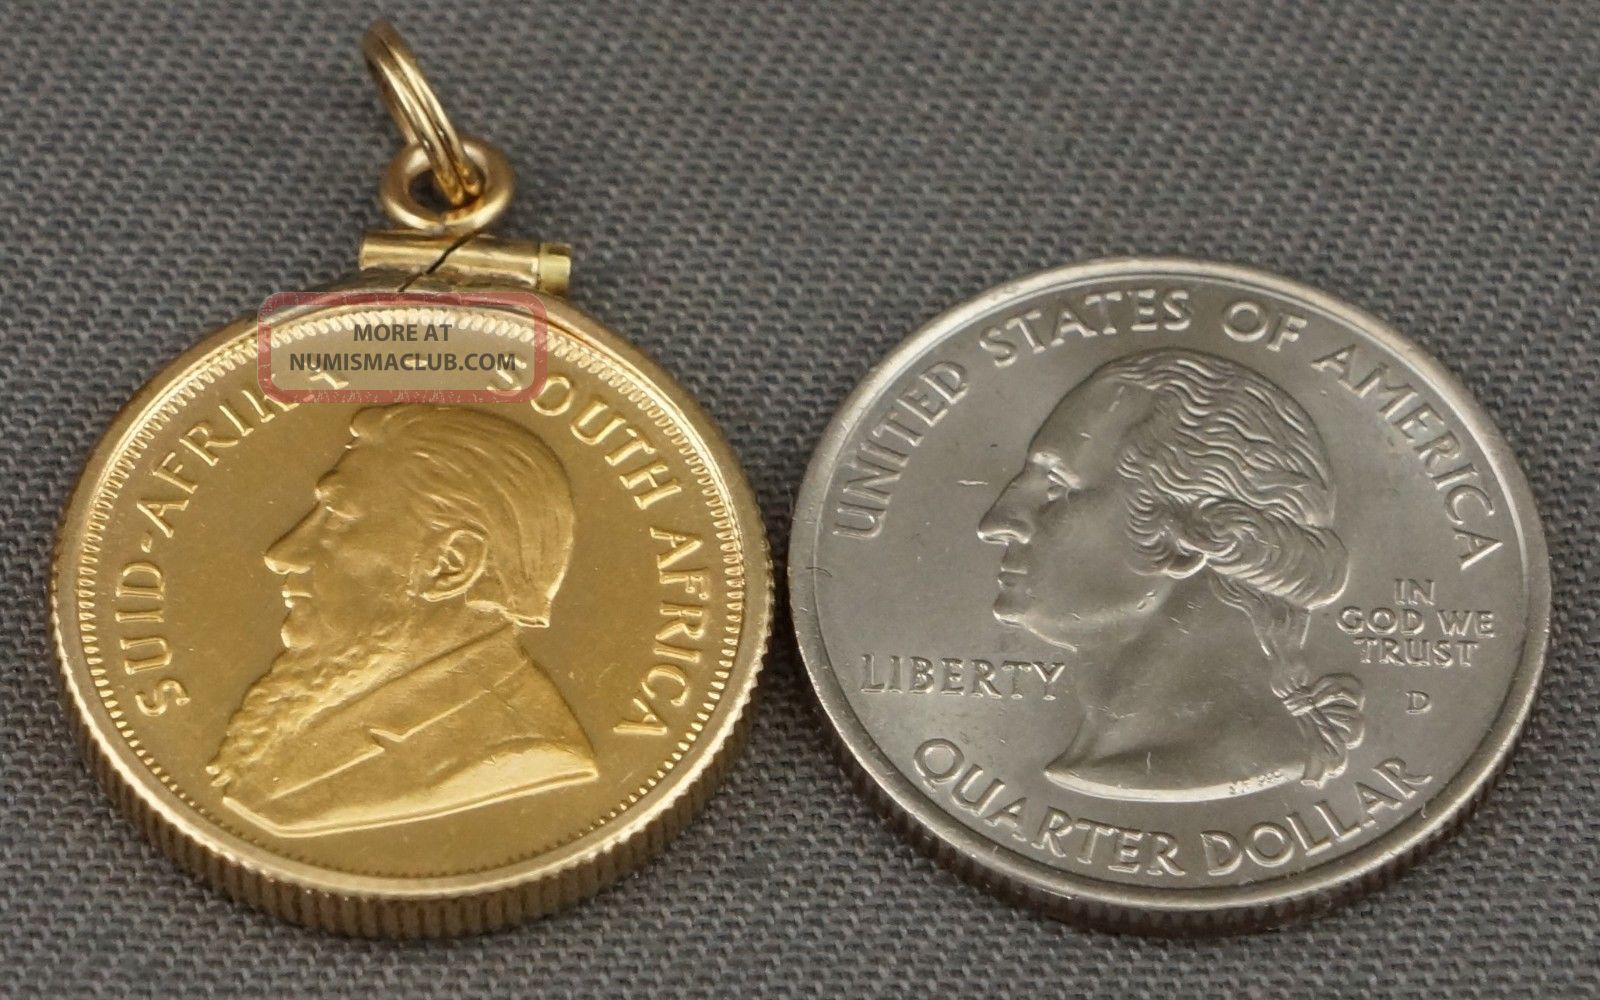 1980 South Africa Krugerrand Gold Coin 1 4 Oz In 14k Gold Fill Bezel Pendant Nr